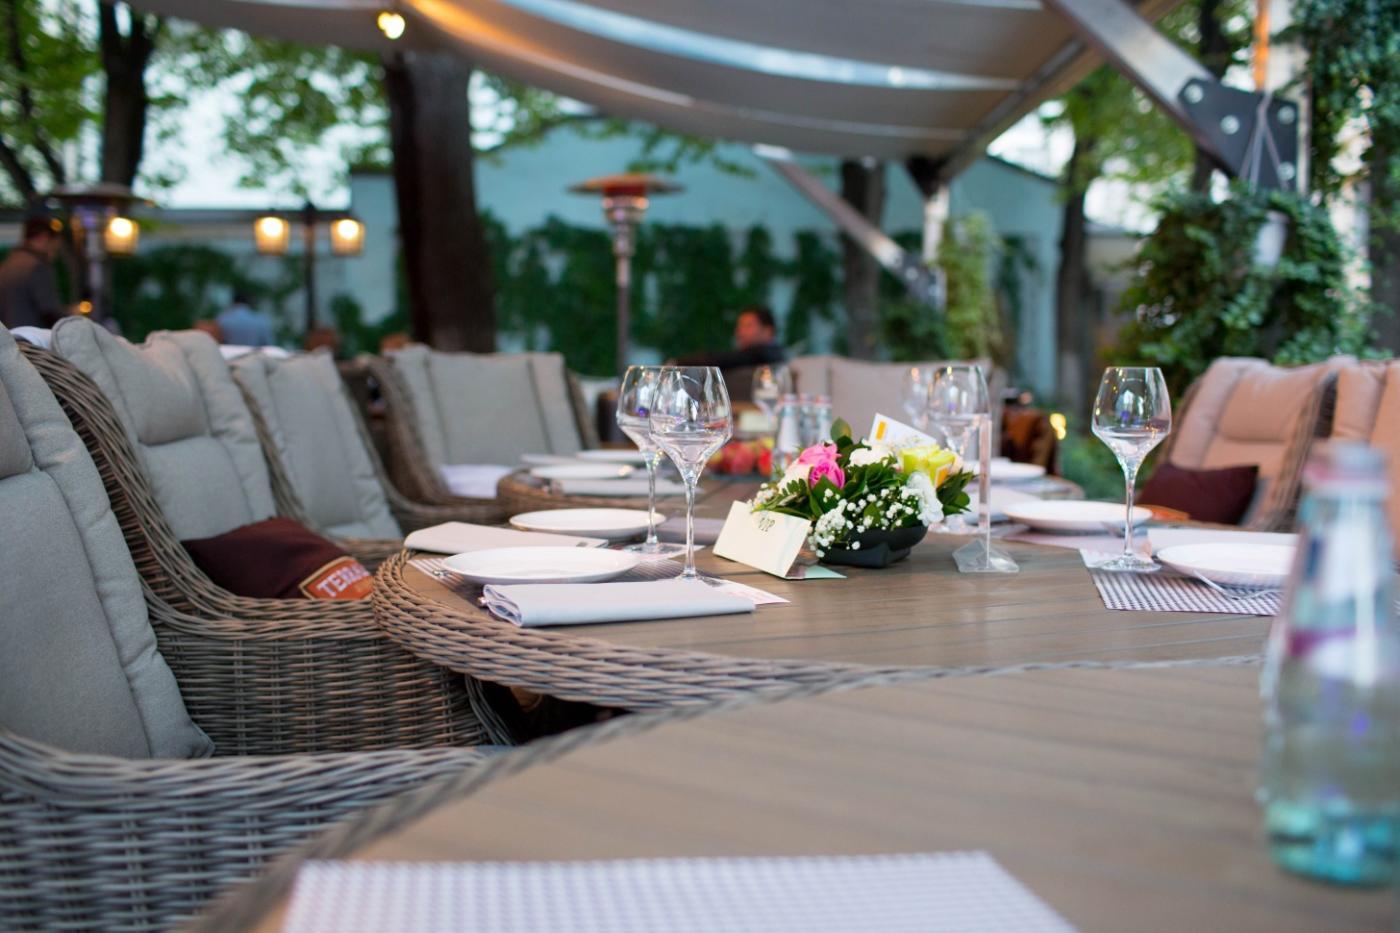 Аргентинский Ресторан Эль Гаучито на Поварской (El Gauchito) фото 30